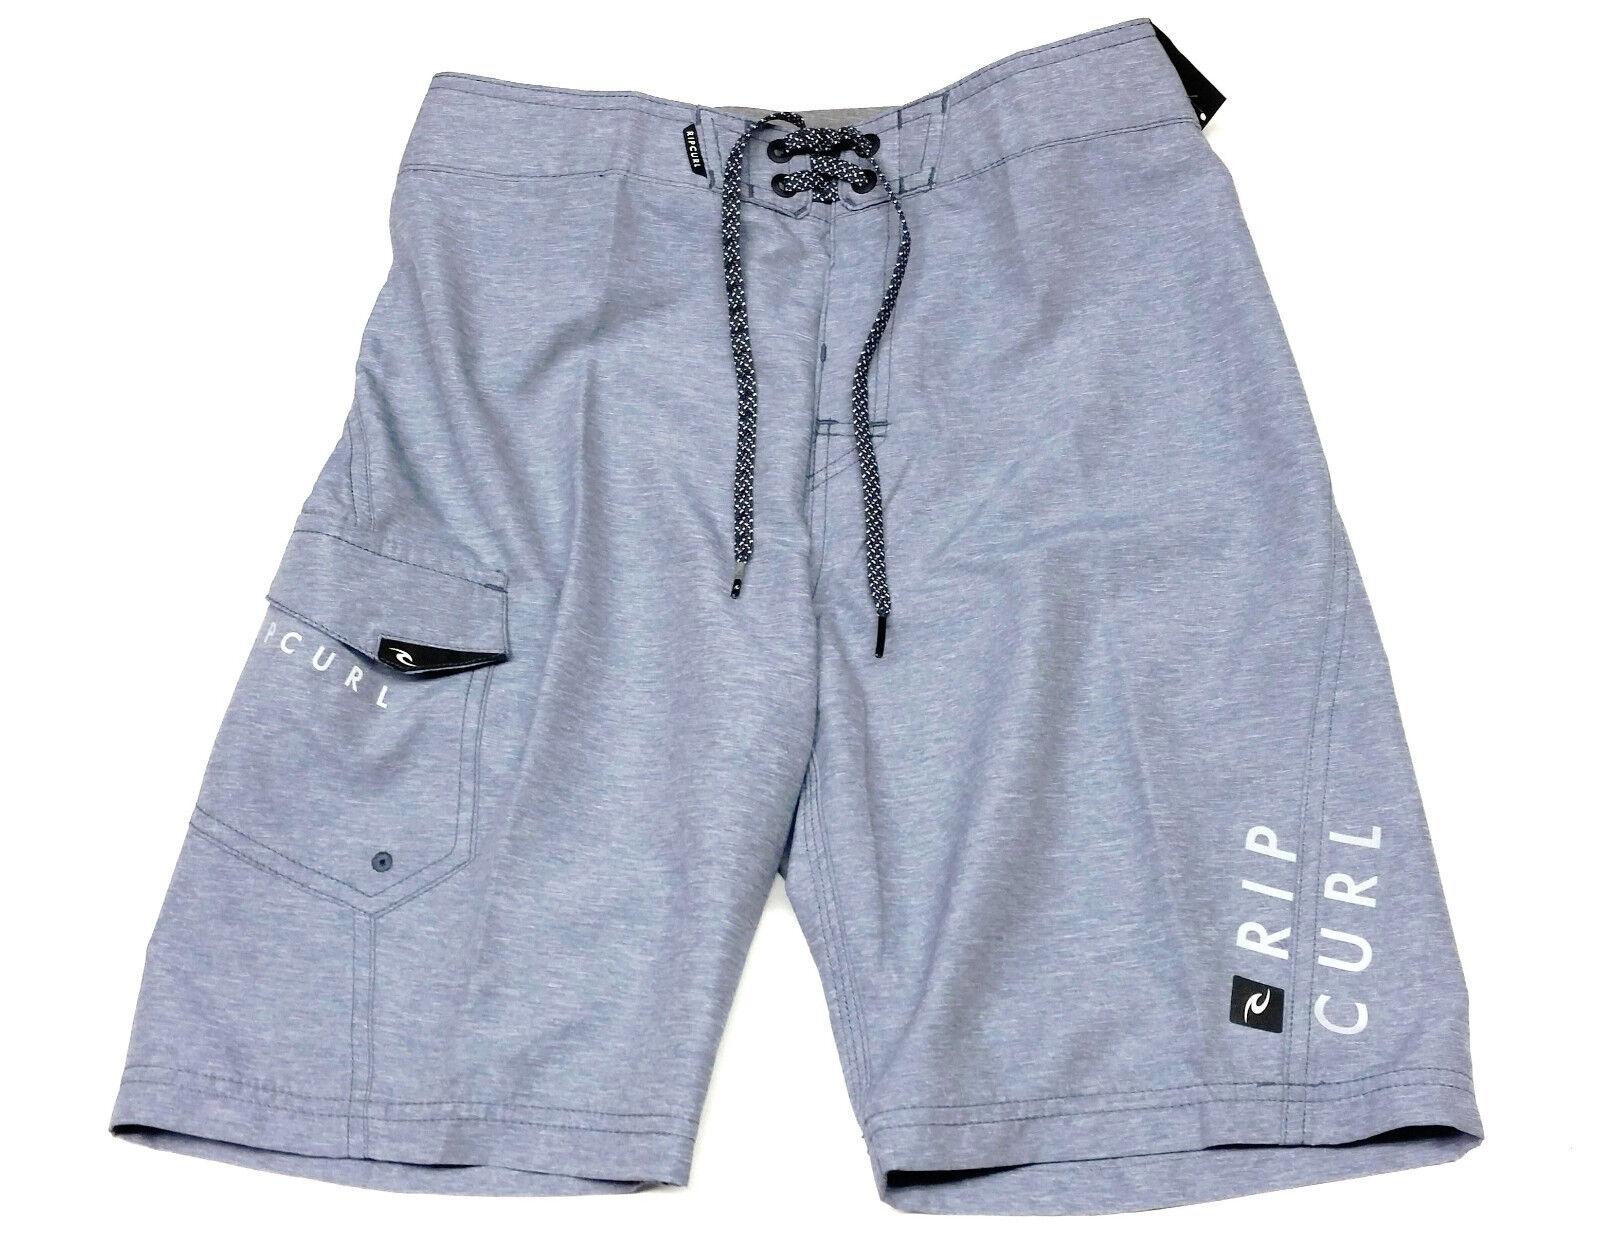 016059dbe3 RIP CURL Men's DAWN Boardshorts - NAV - Size - NWT 30 PATROL ...